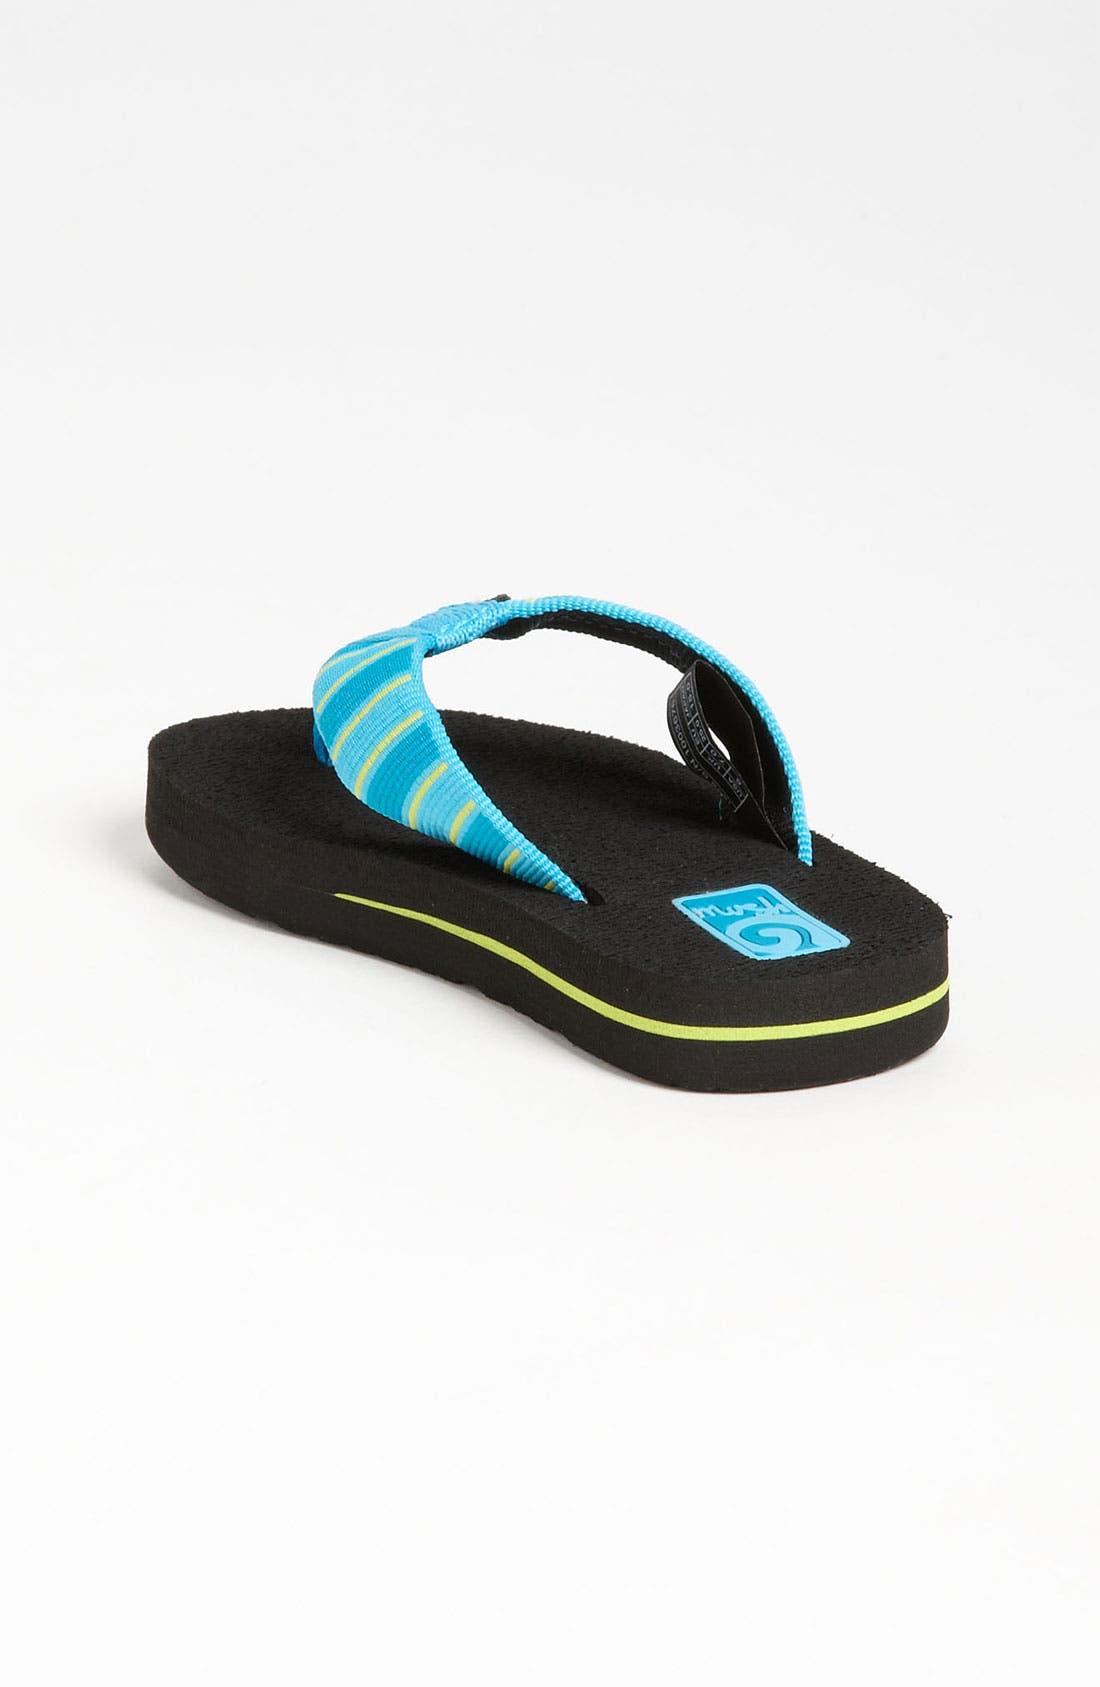 Alternate Image 2  - Teva 'Mush' Sandal (Toddler, Little Kid & Big Kid)